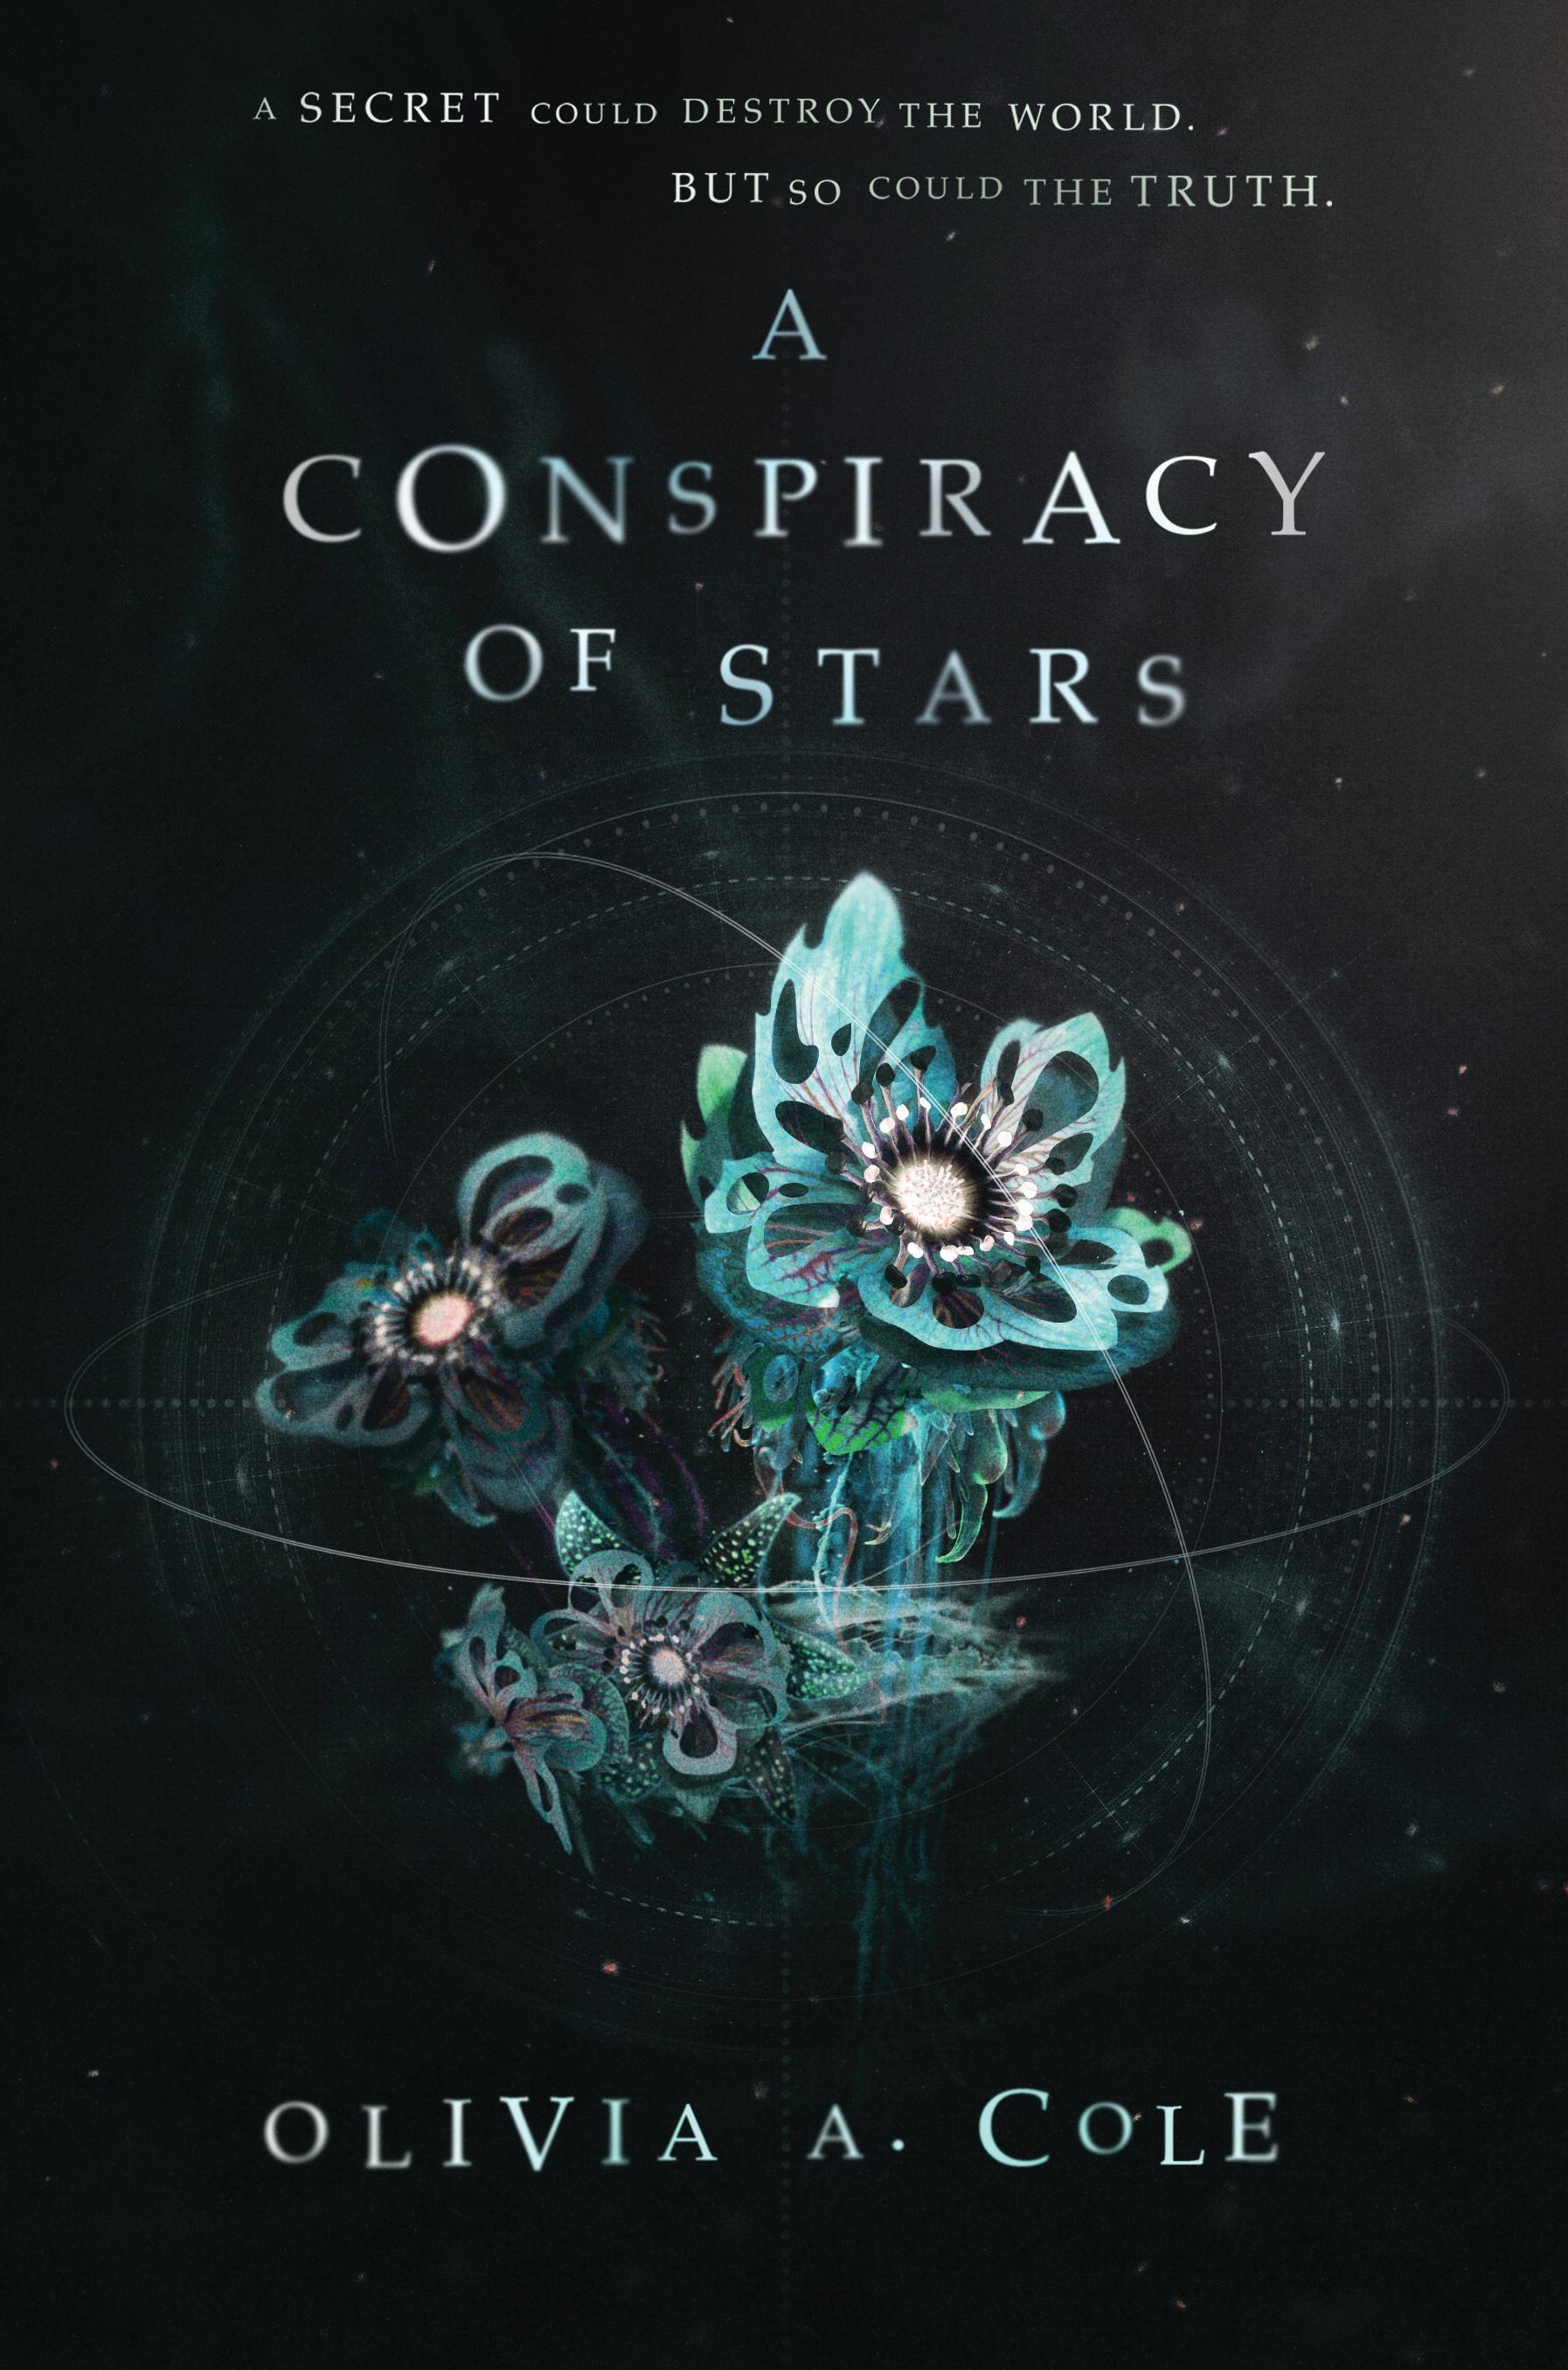 ConspiracyOfStars_HC_C (3).JPG